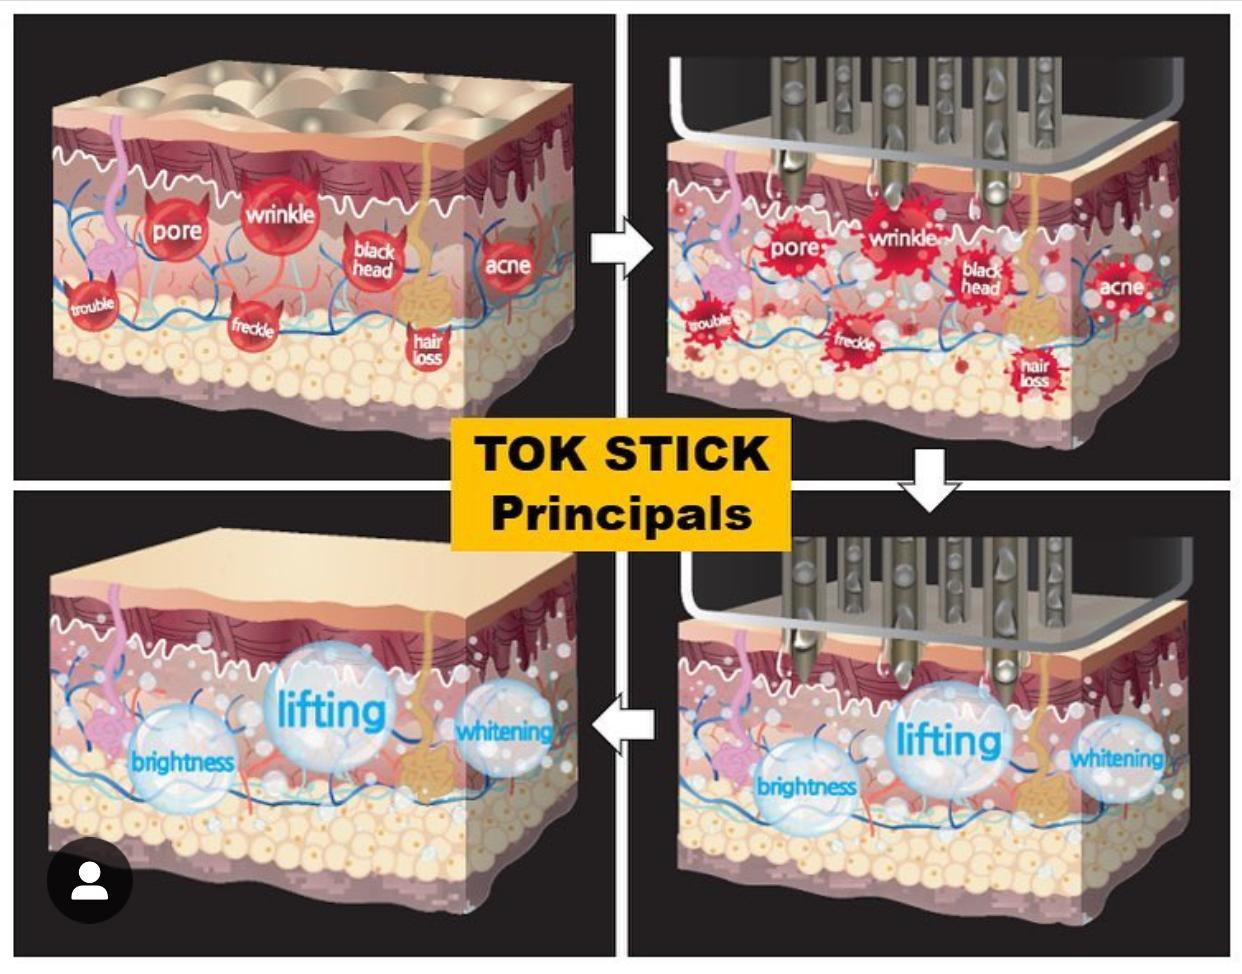 tok stick